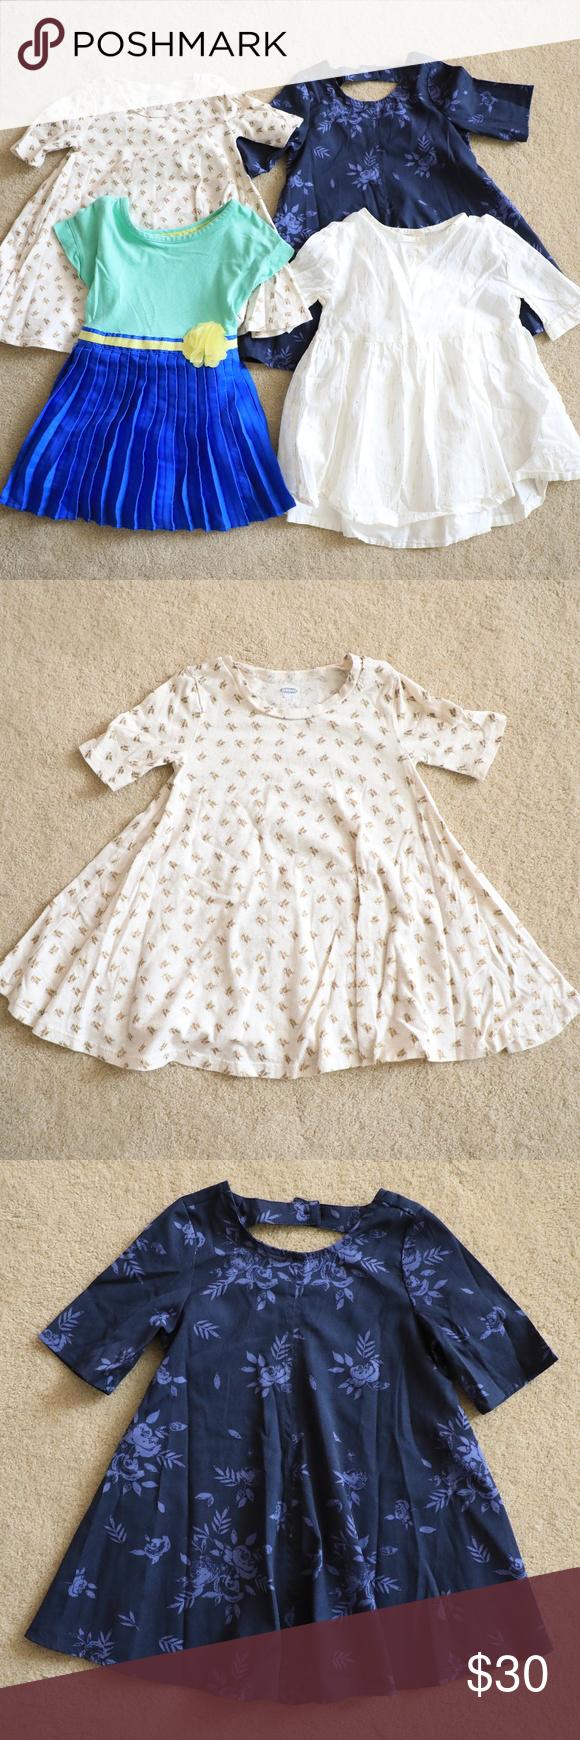 Lot Of 4 Toddler Girl S Dresses 2t Toddler Girl Dresses Floral Blue Dress Girls Dresses [ 1740 x 580 Pixel ]